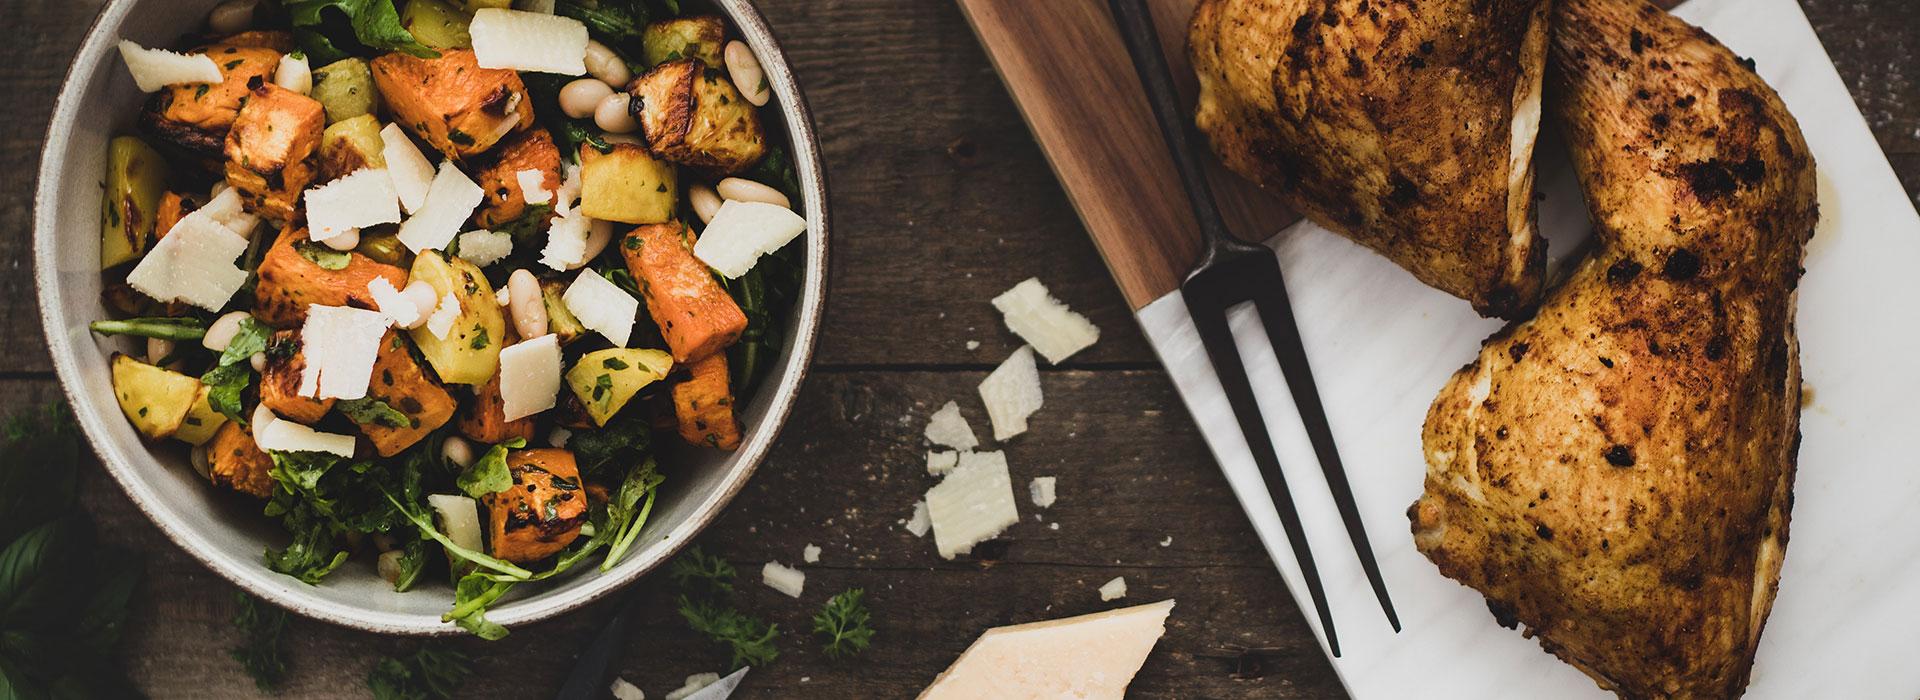 Kartoffelslalat mit Kräuteröl